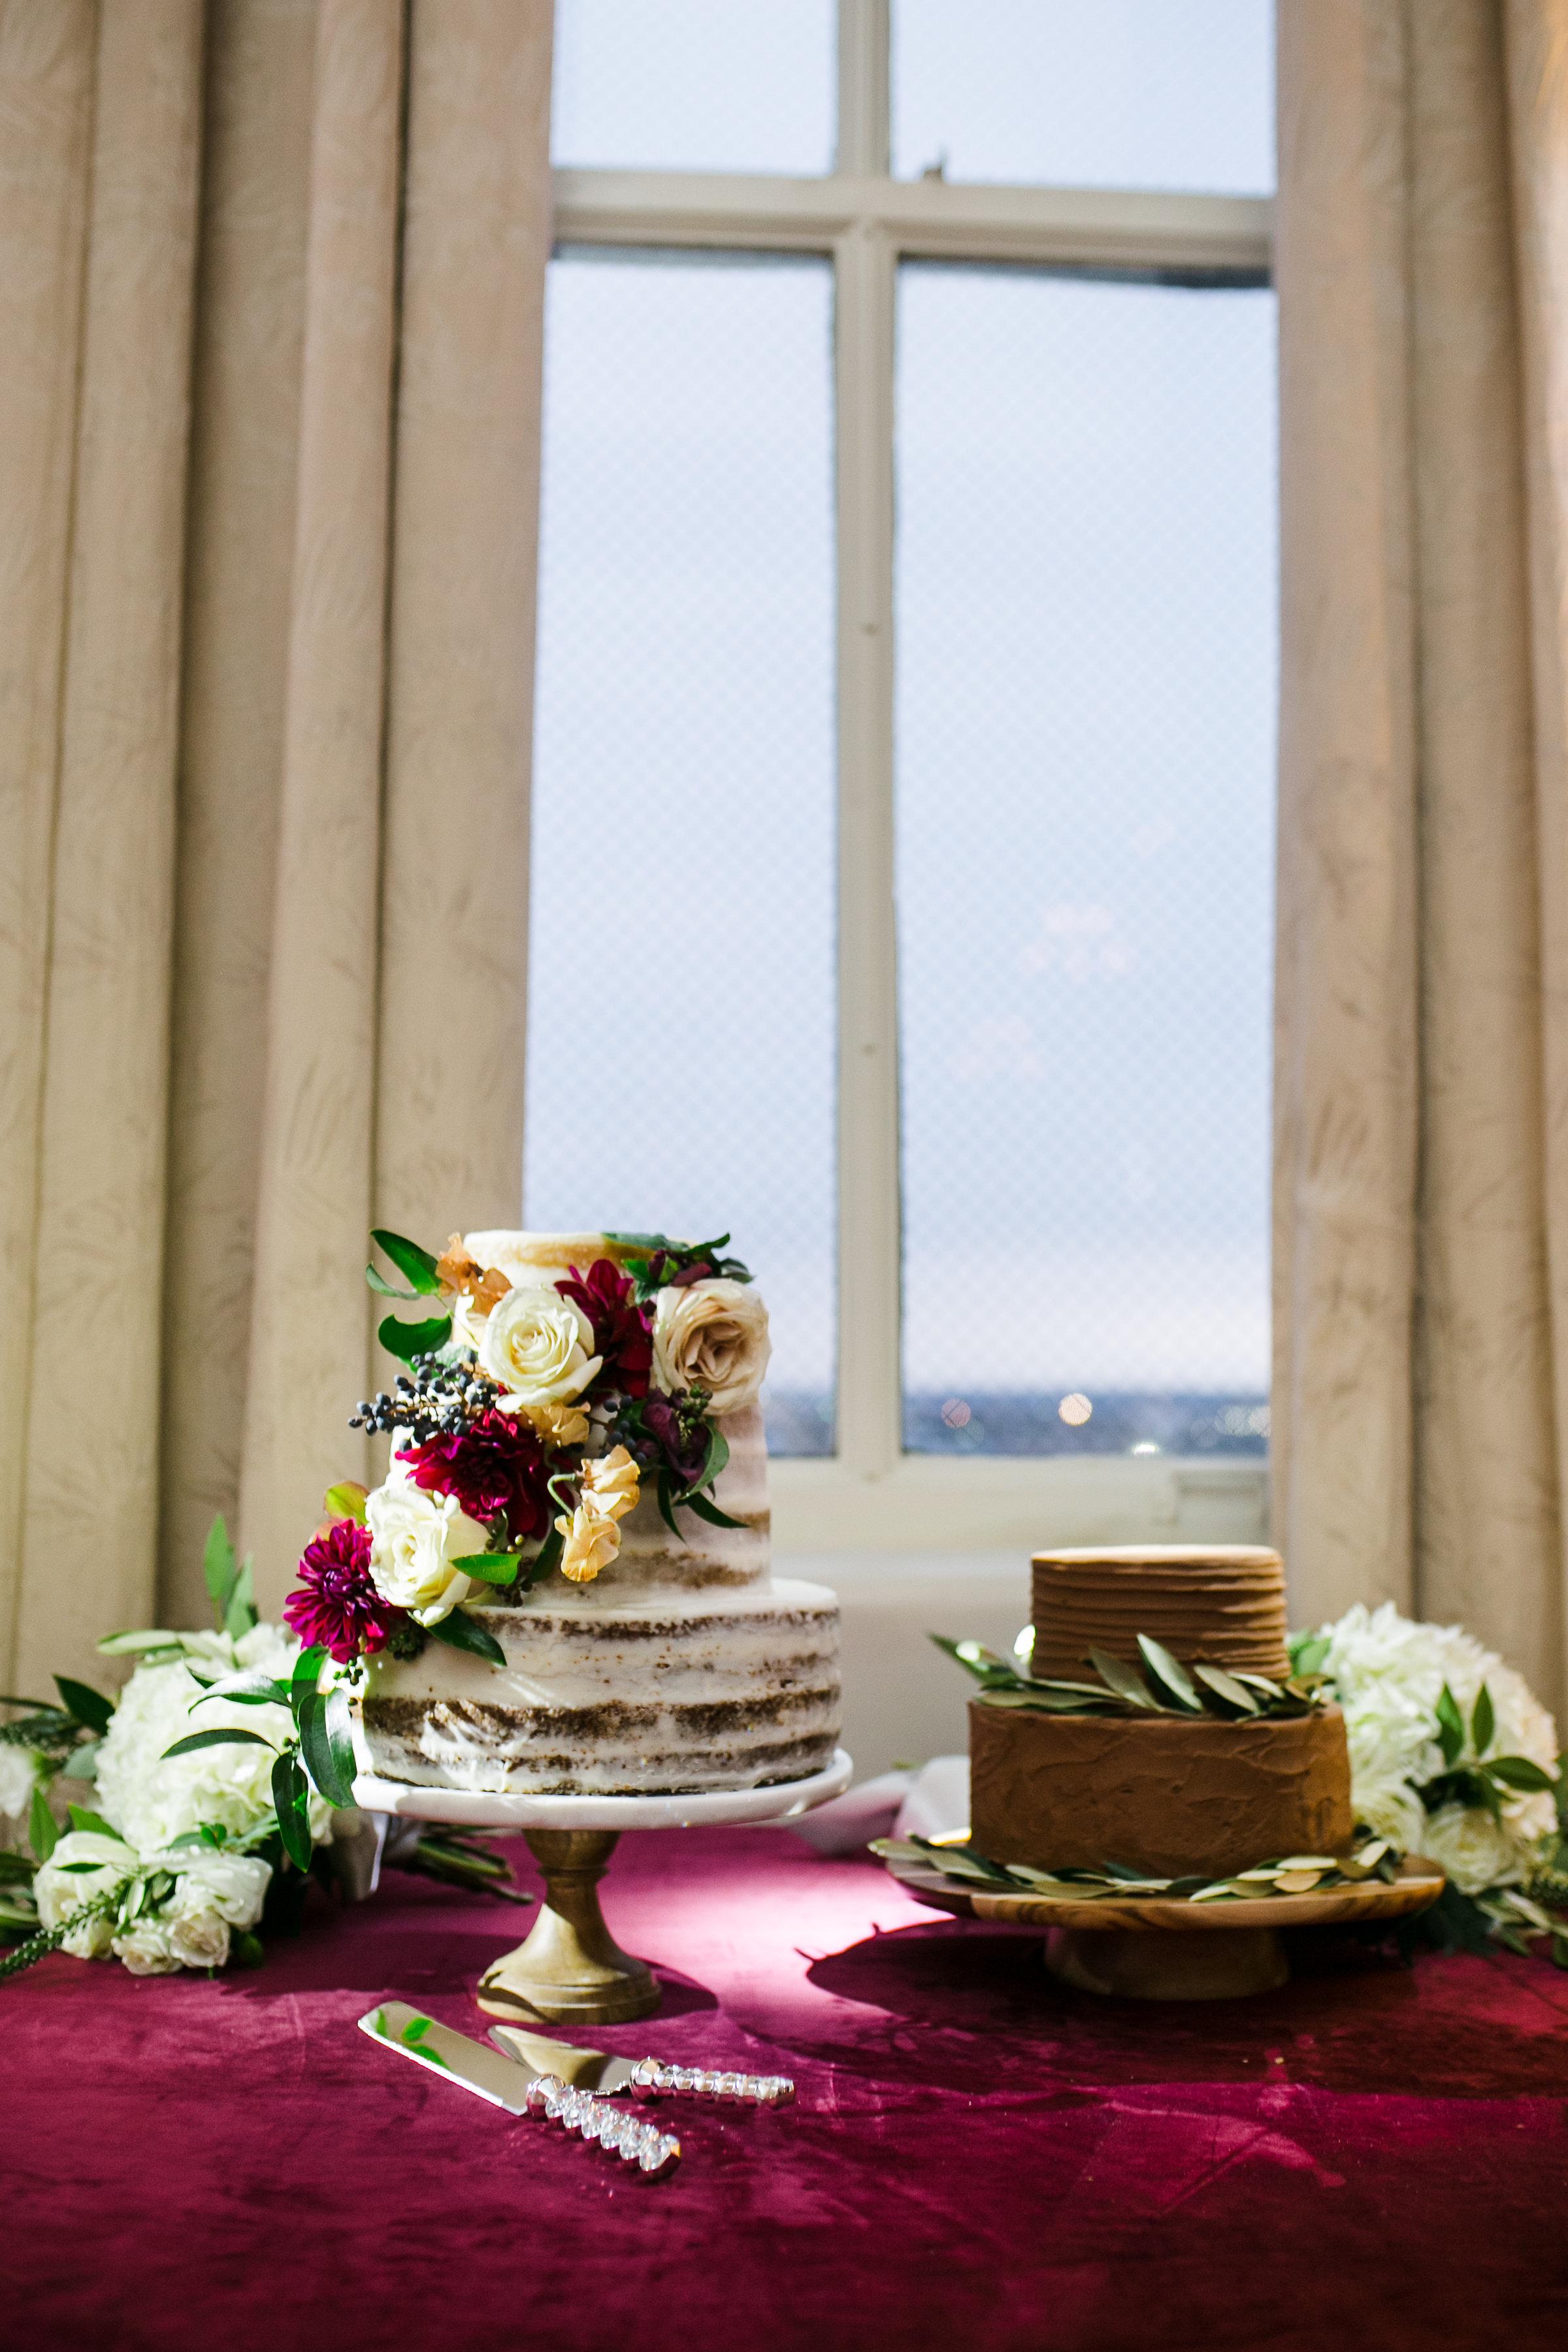 Cake Details - Dallas, Texas - Winter Wedding - Julian Leaver Events